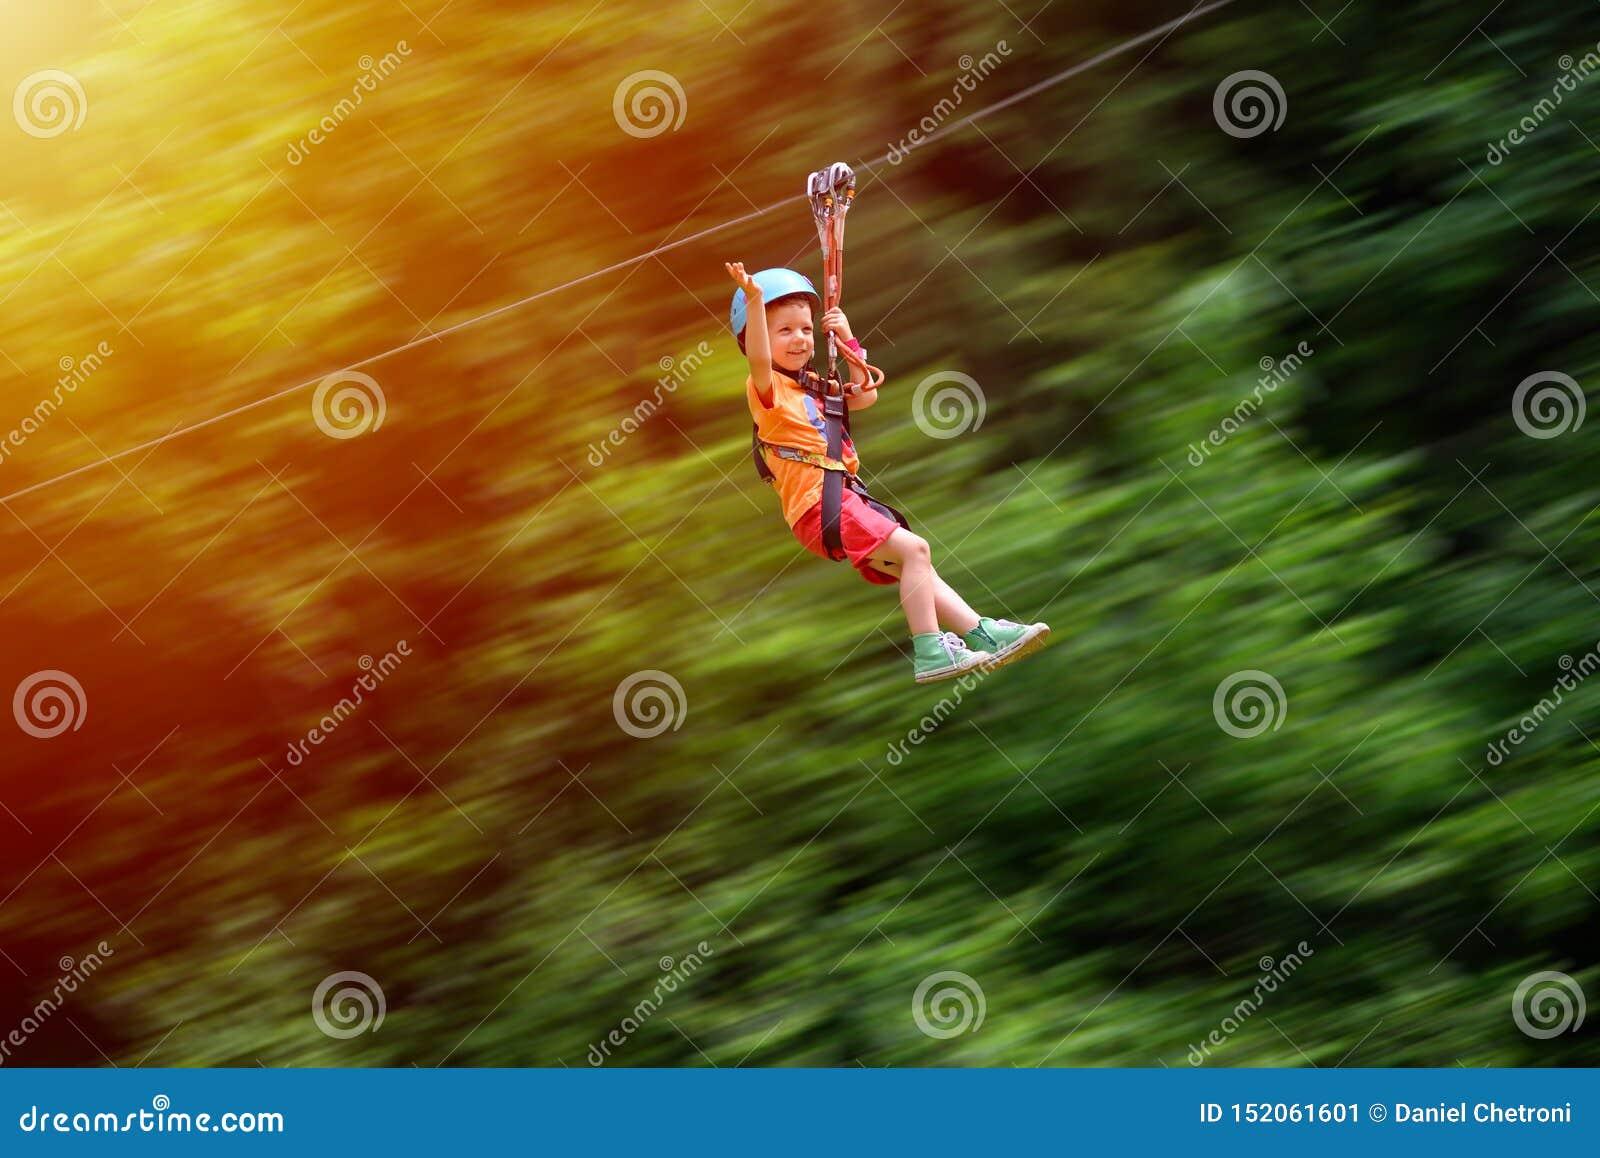 Happy kid with helmet and harness on zip line between trees. Panning effect